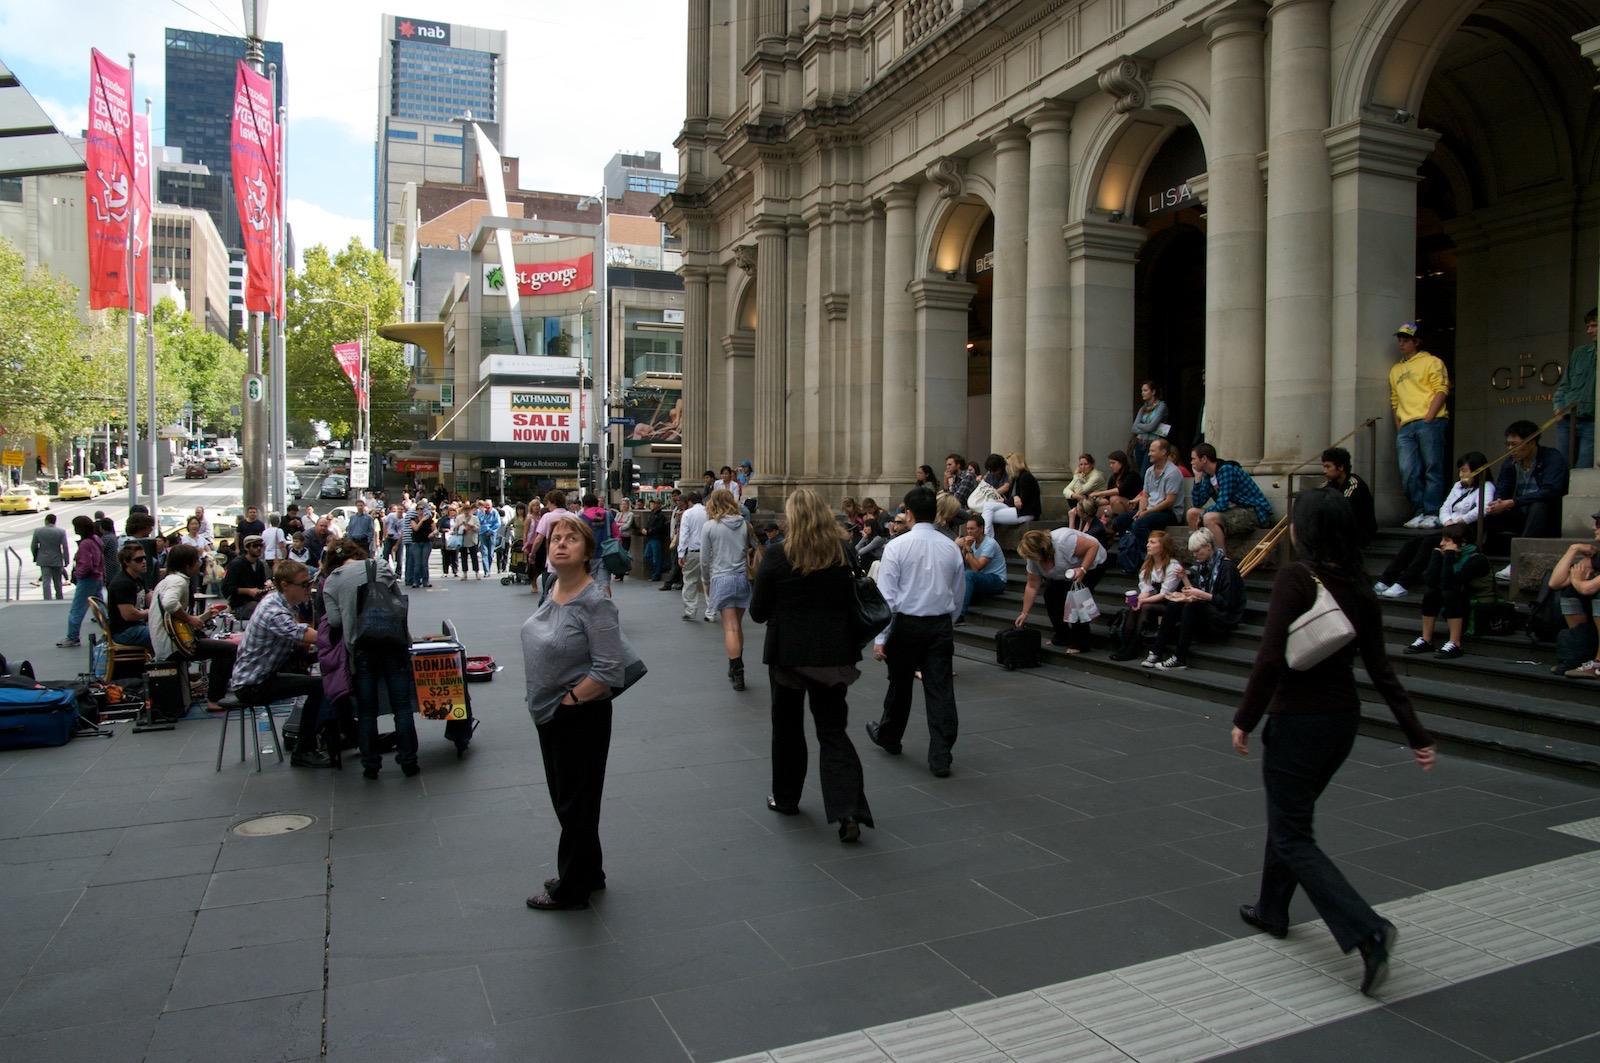 Melbourne stuff - 1 of 223 (22).jpg